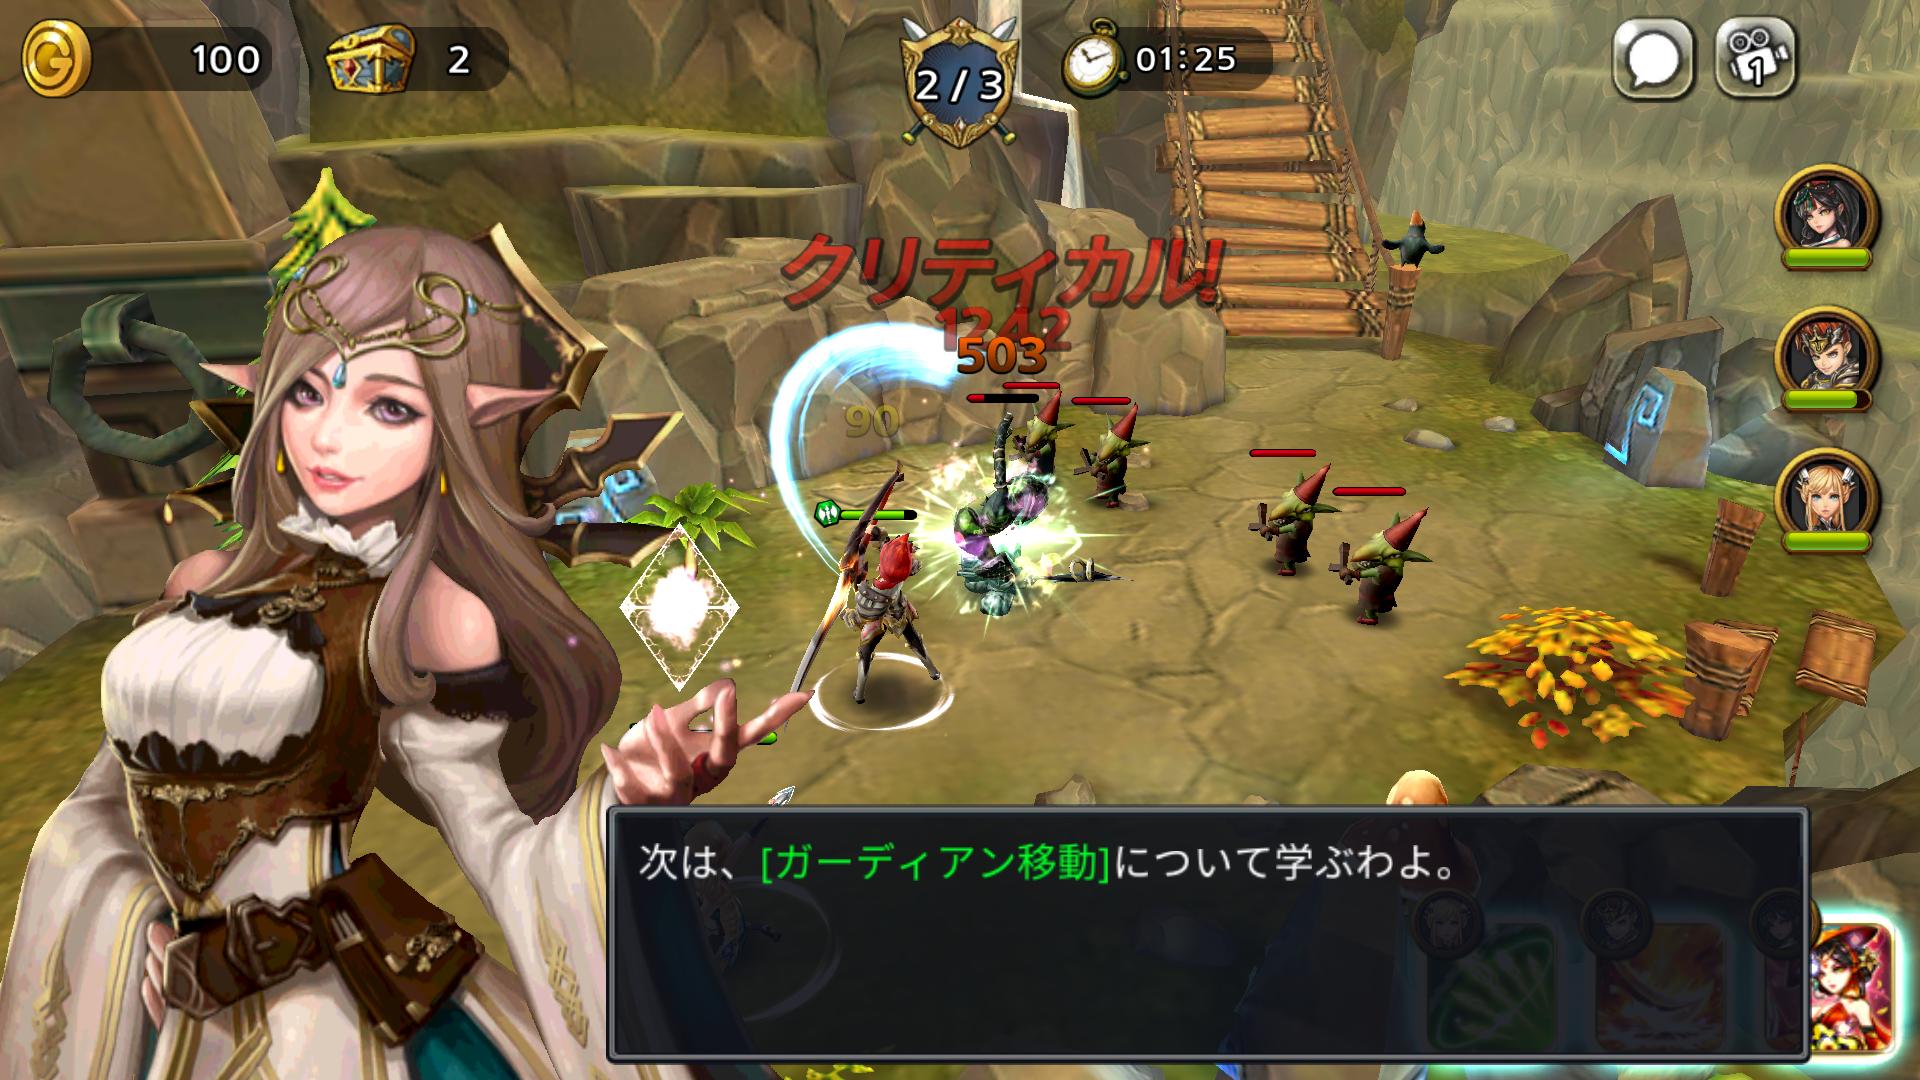 androidアプリ Guardian Soul : Legion(ガーディアンソウル)攻略スクリーンショット2